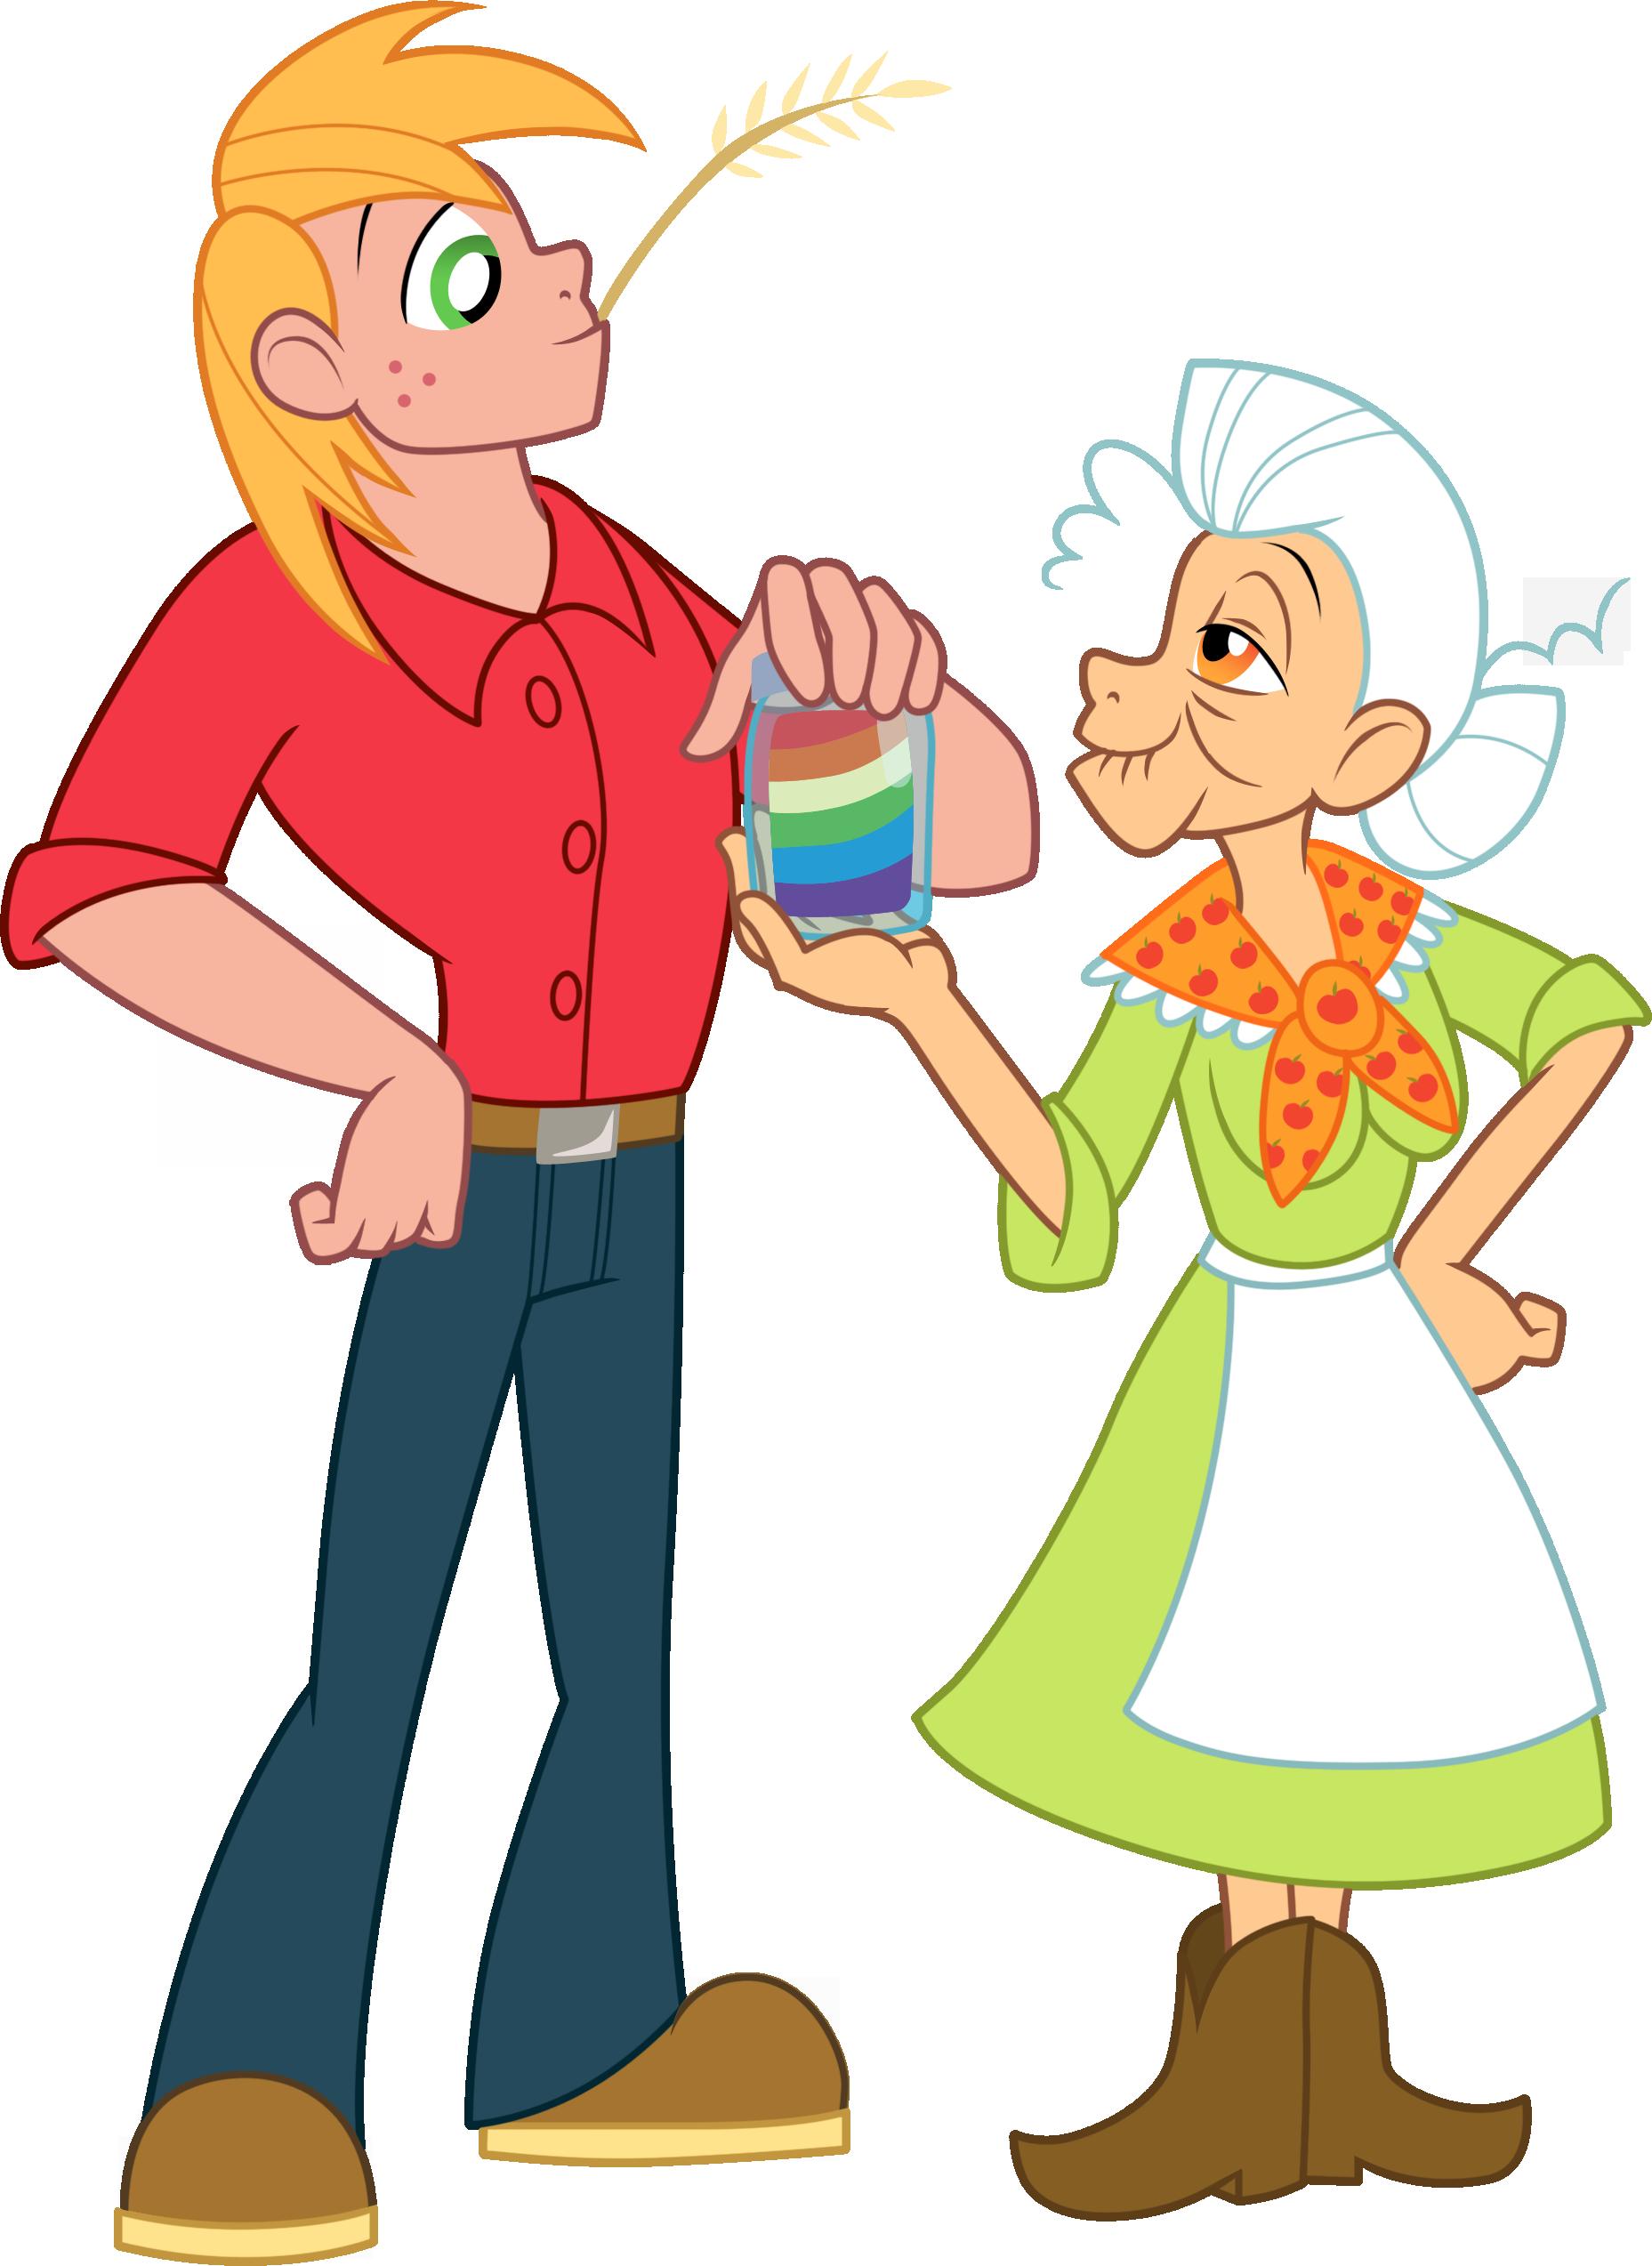 Image Big Mac and Granny Smith